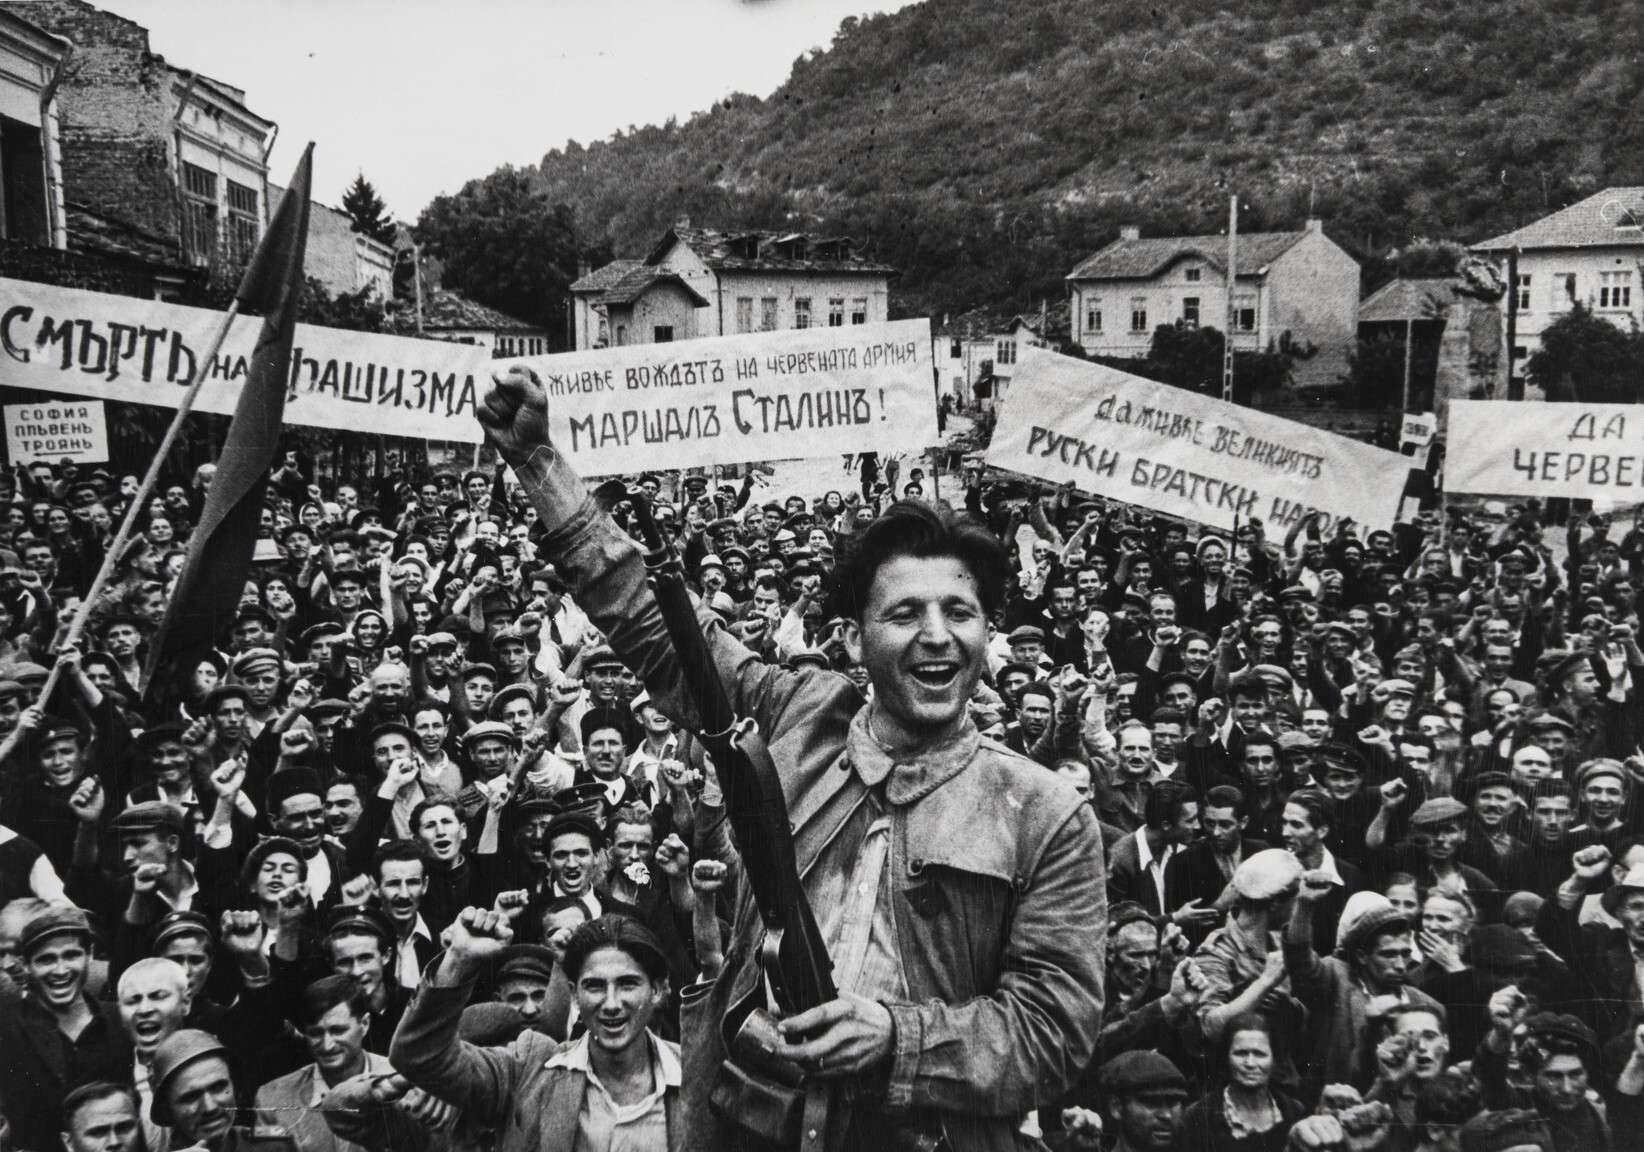 Евгений Халдей.    Освобождение Болгарии. Коча Караджев   Болгария, 1944